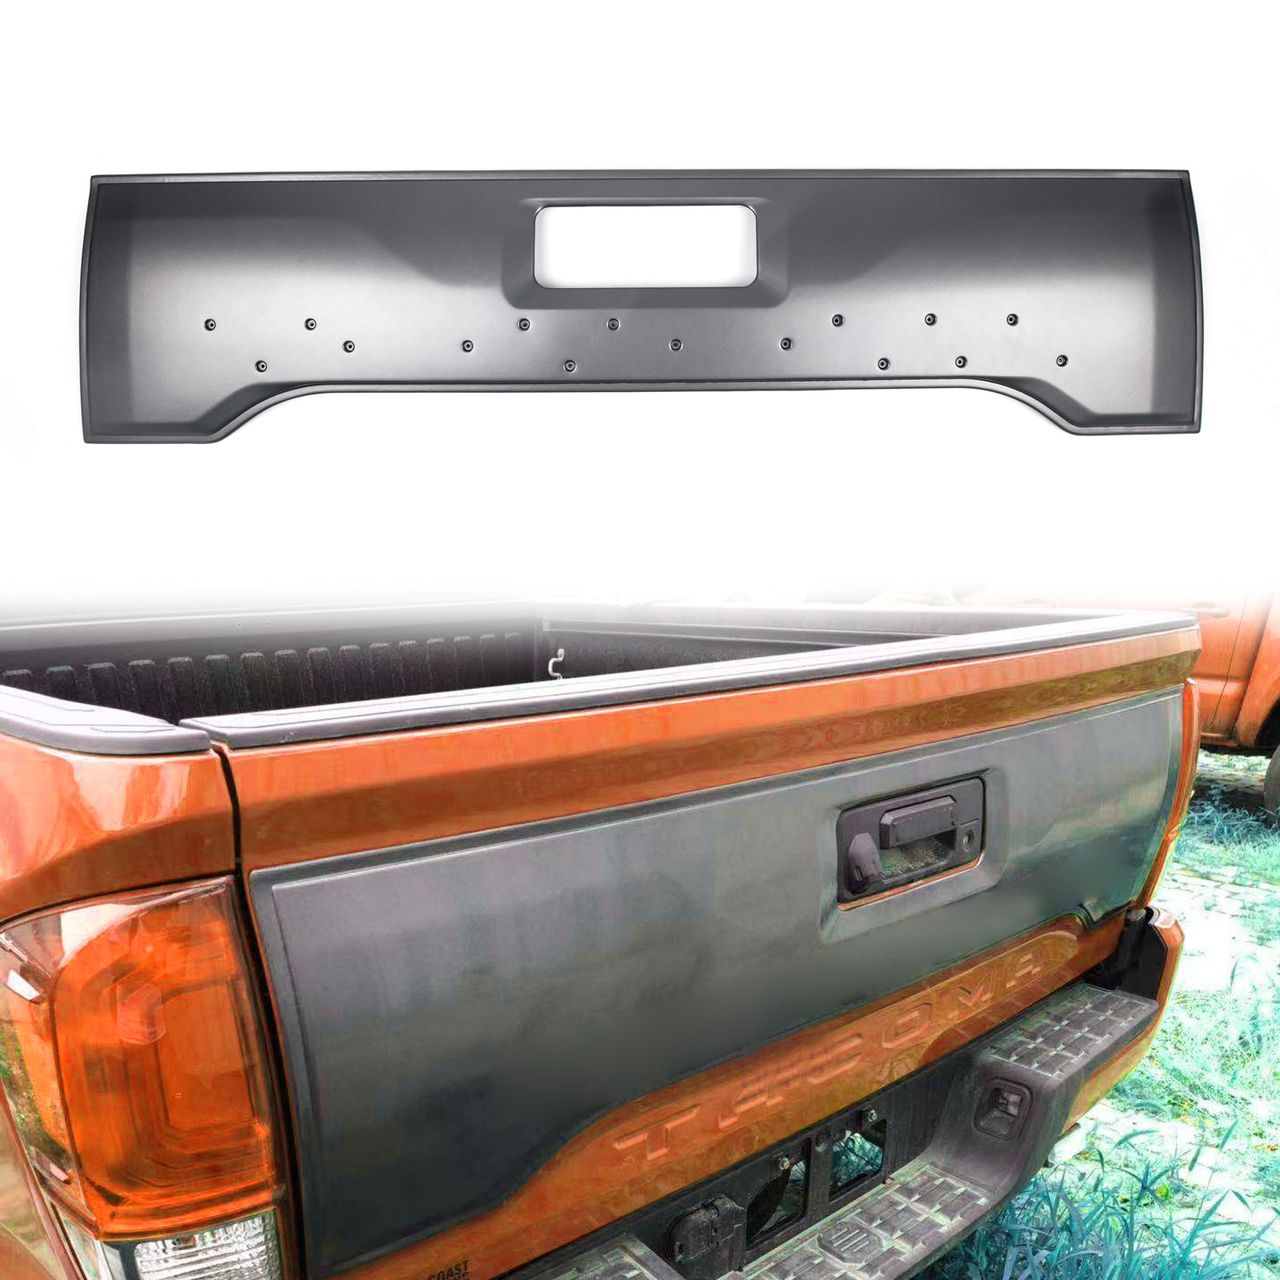 Tailgate Applique Cover Rear Trim Panel with TRD Emblem